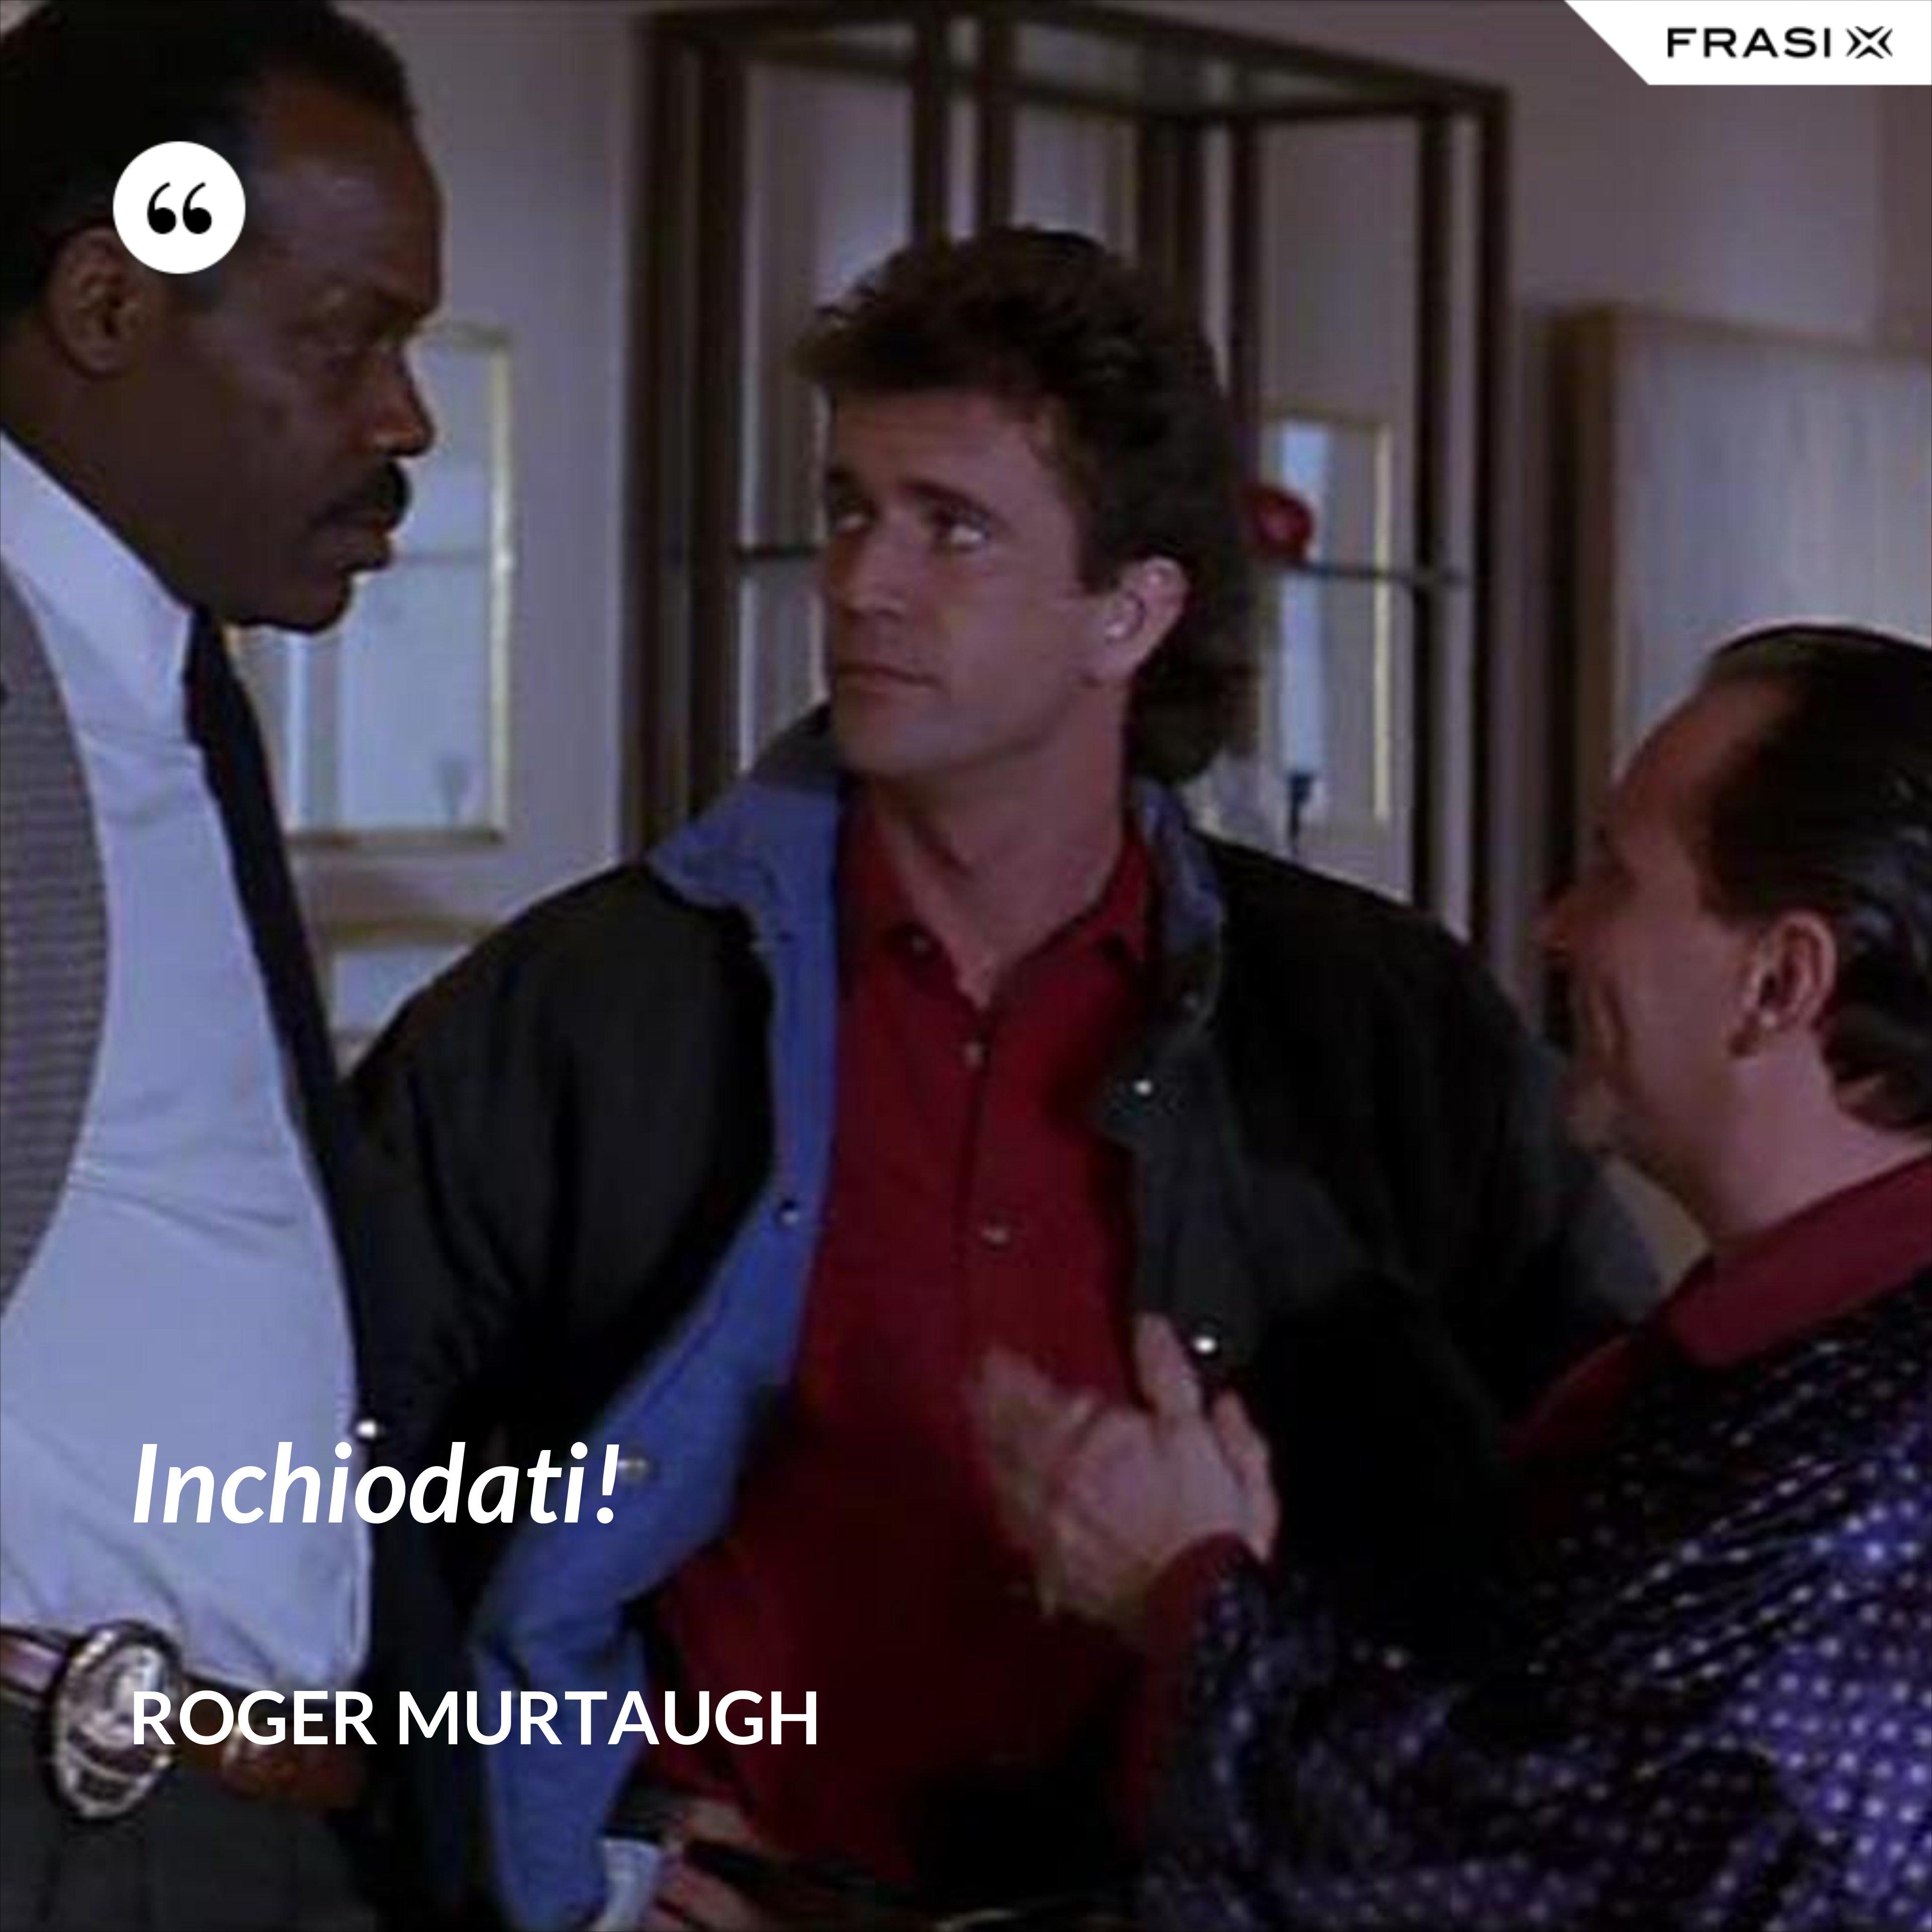 Inchiodati! - Roger Murtaugh